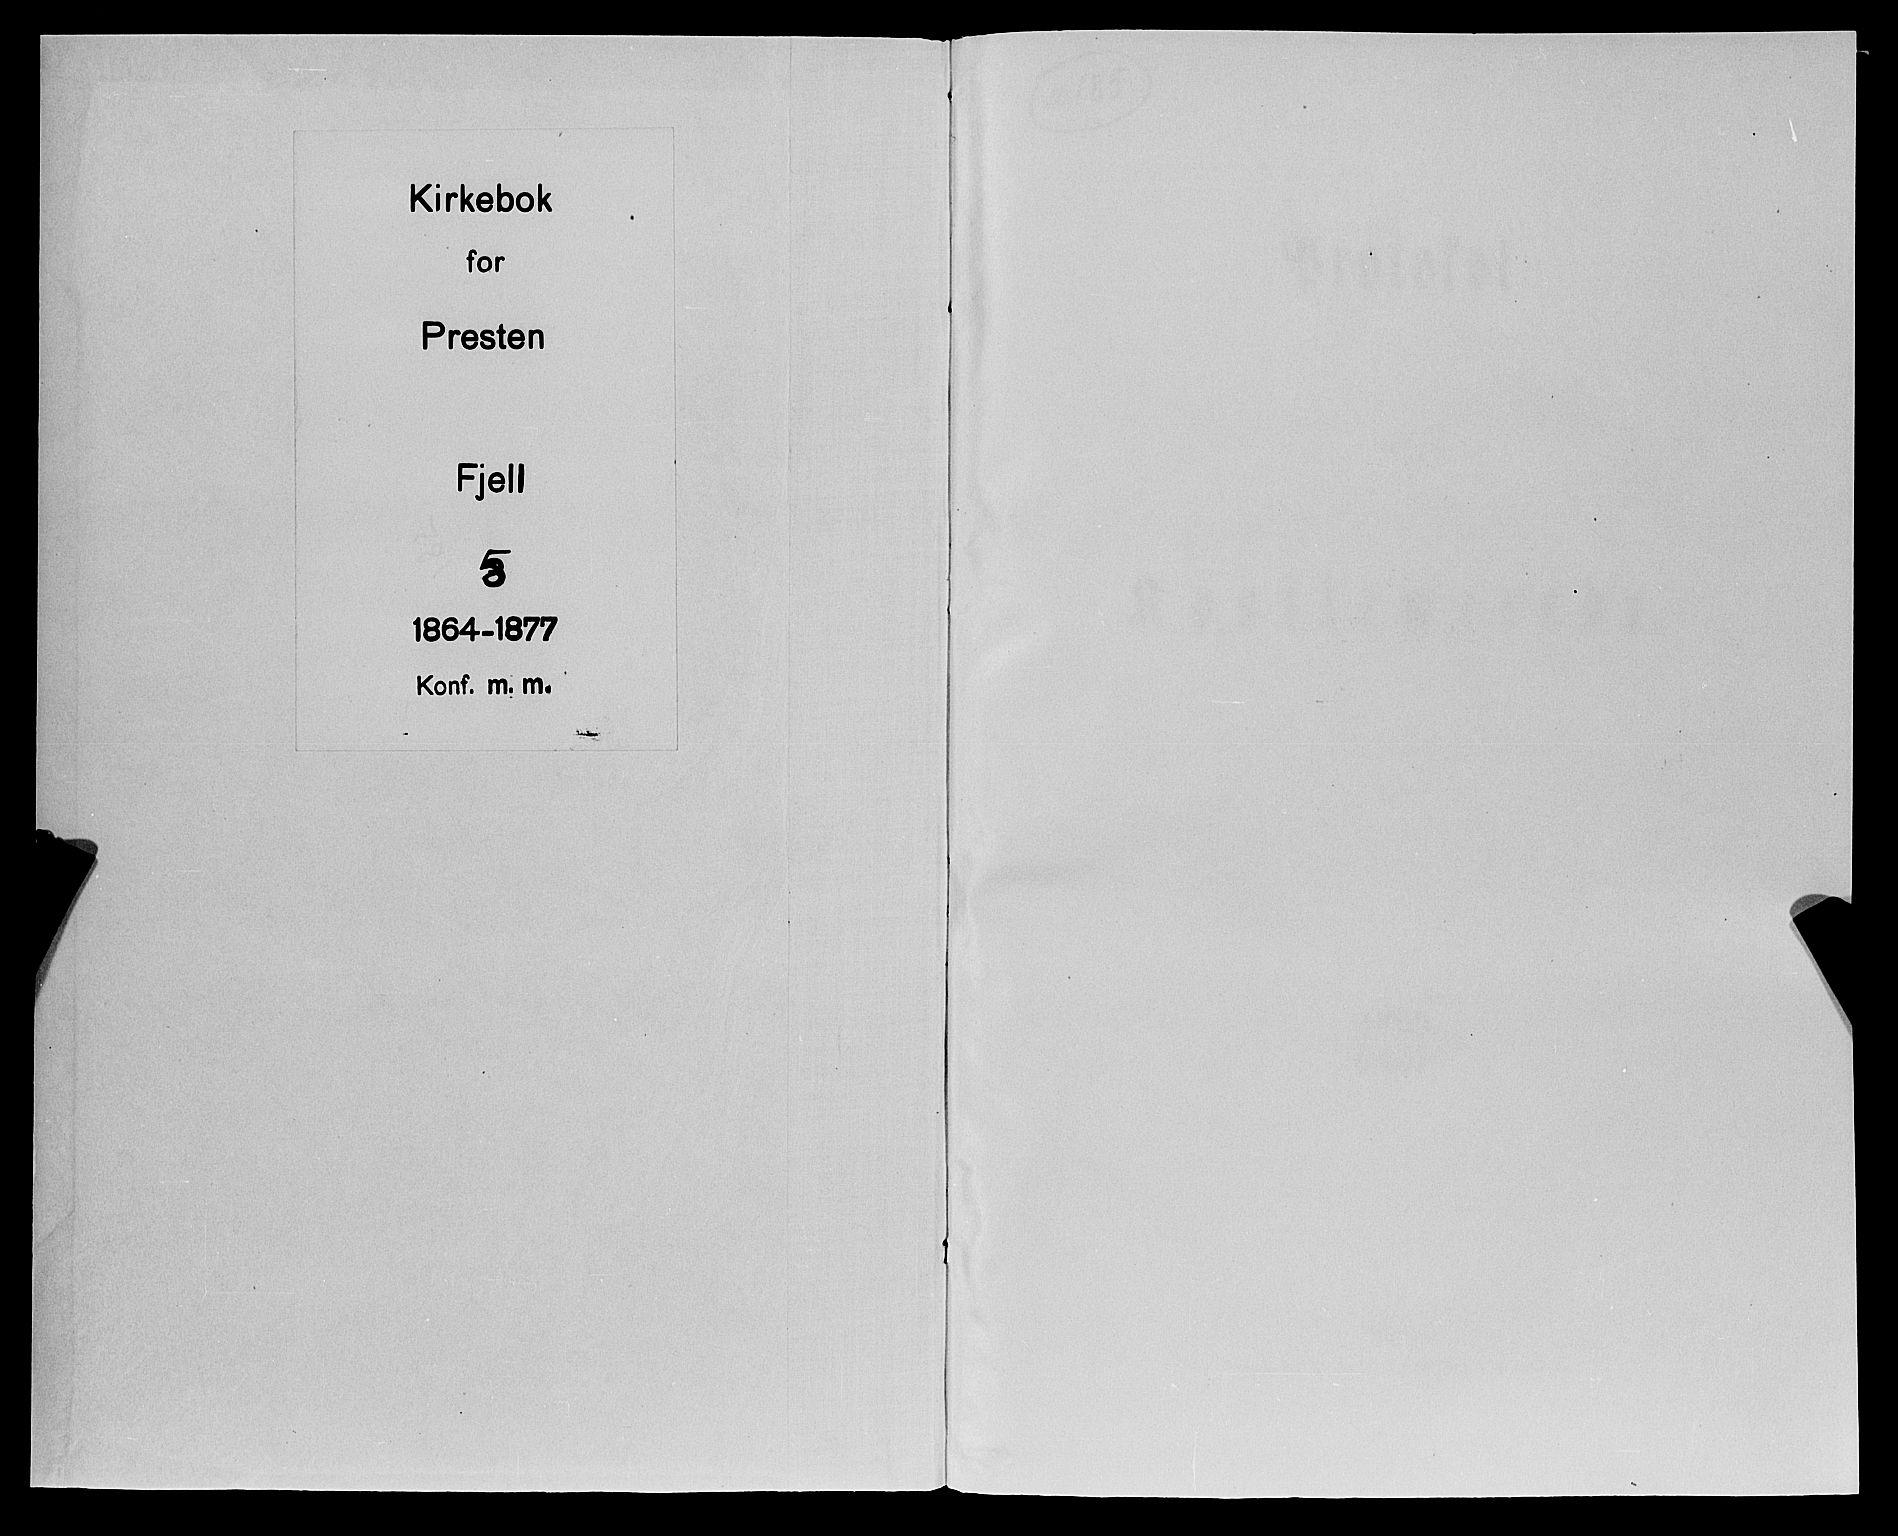 SAB, Fjell sokneprestembete, H/Haa: Parish register (official) no. A 5, 1864-1877